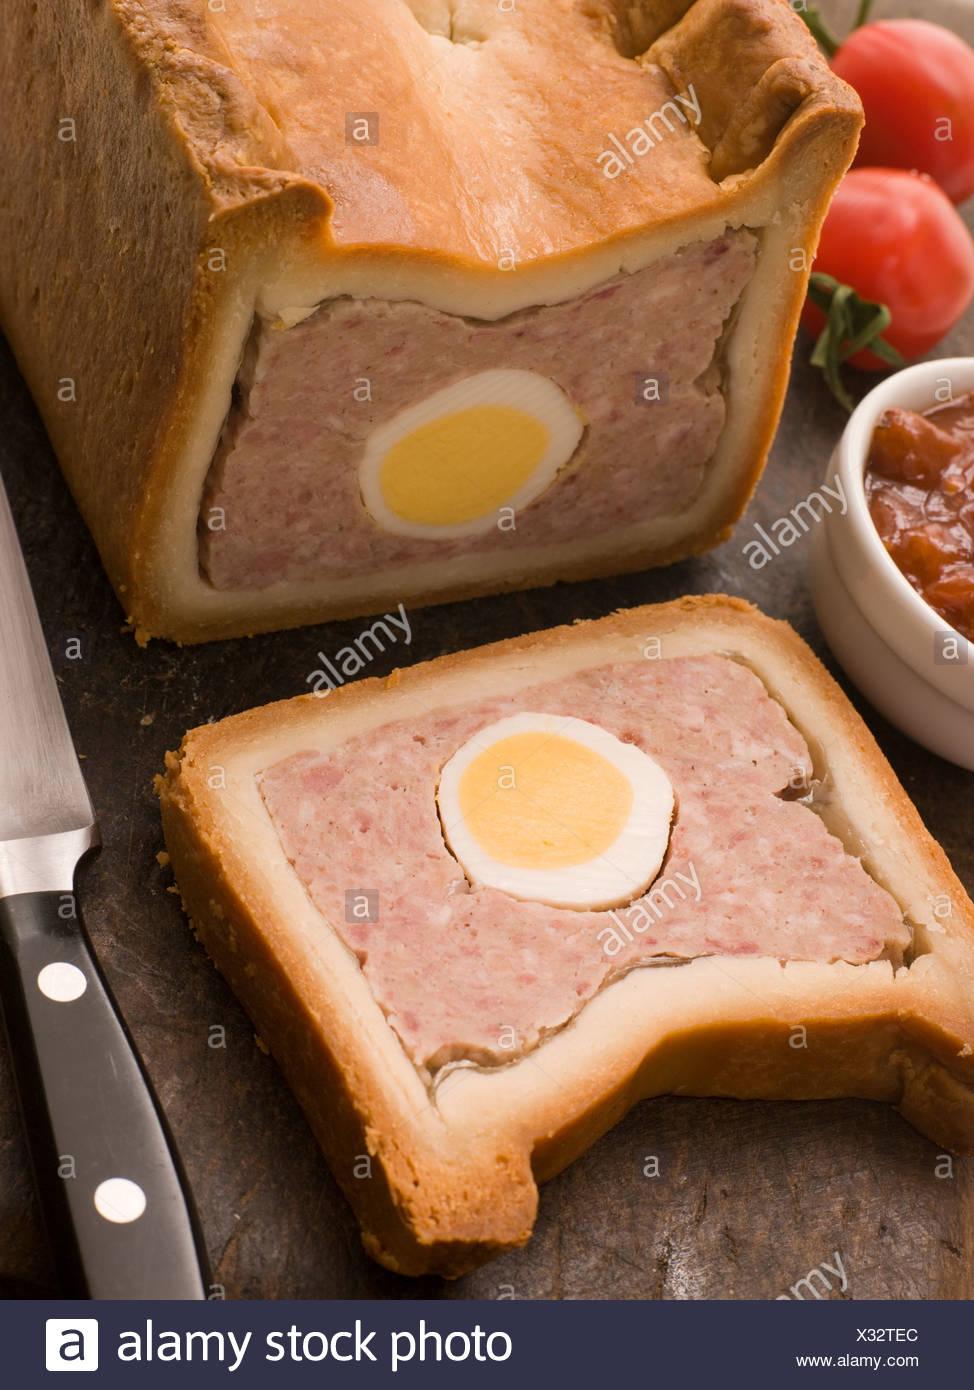 Pork and Egg Gala Pie with Tomato Chutney - Stock Image